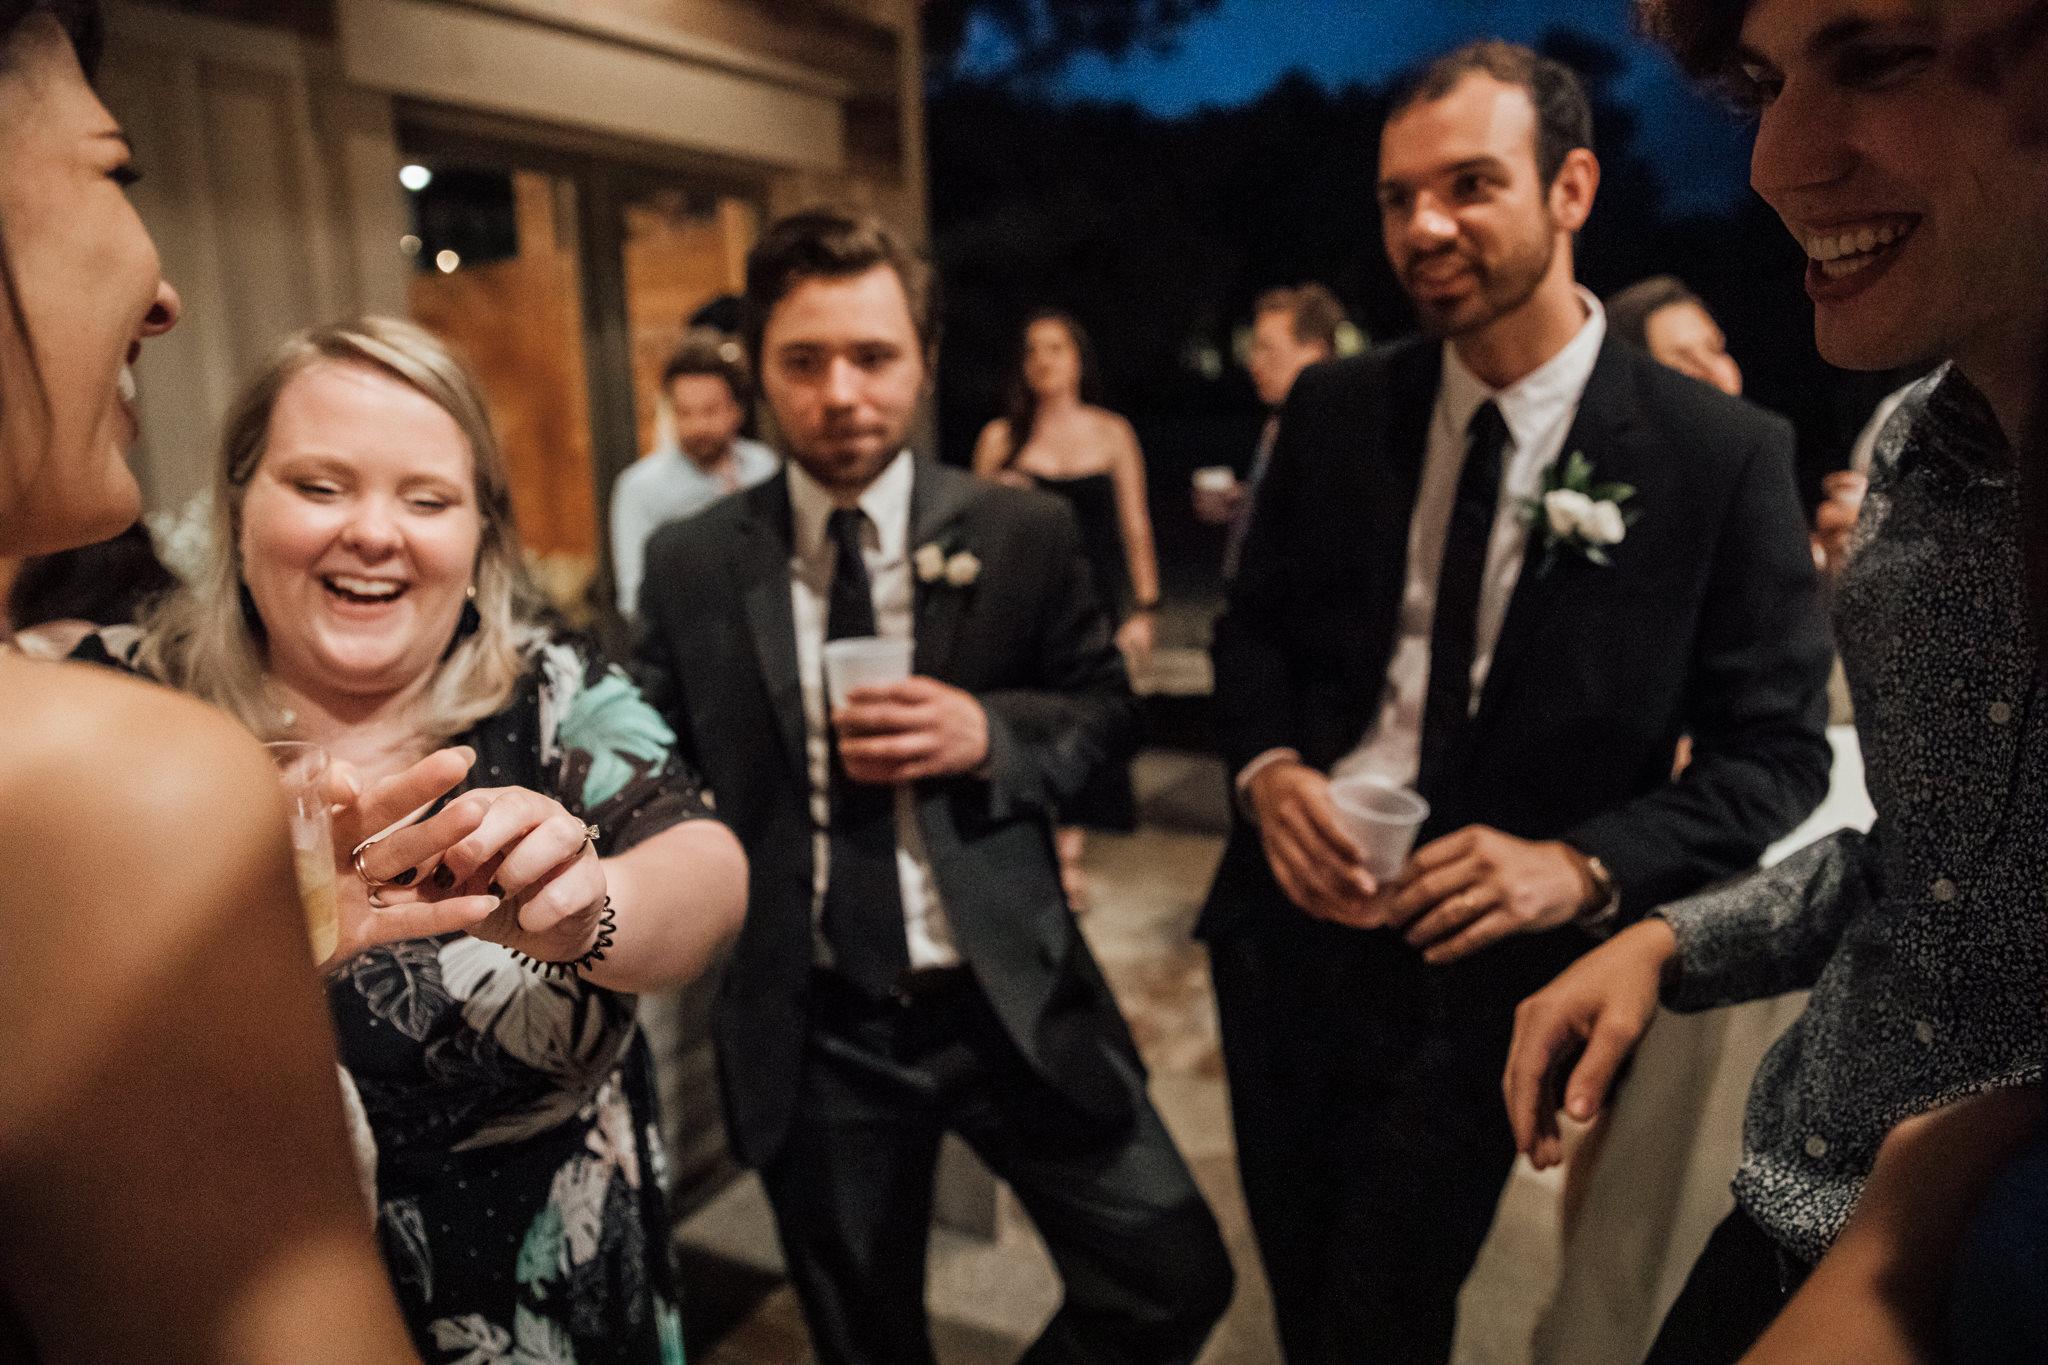 phantom-canyon-brewery-colorado-springs-wedding-photographer-455.jpg